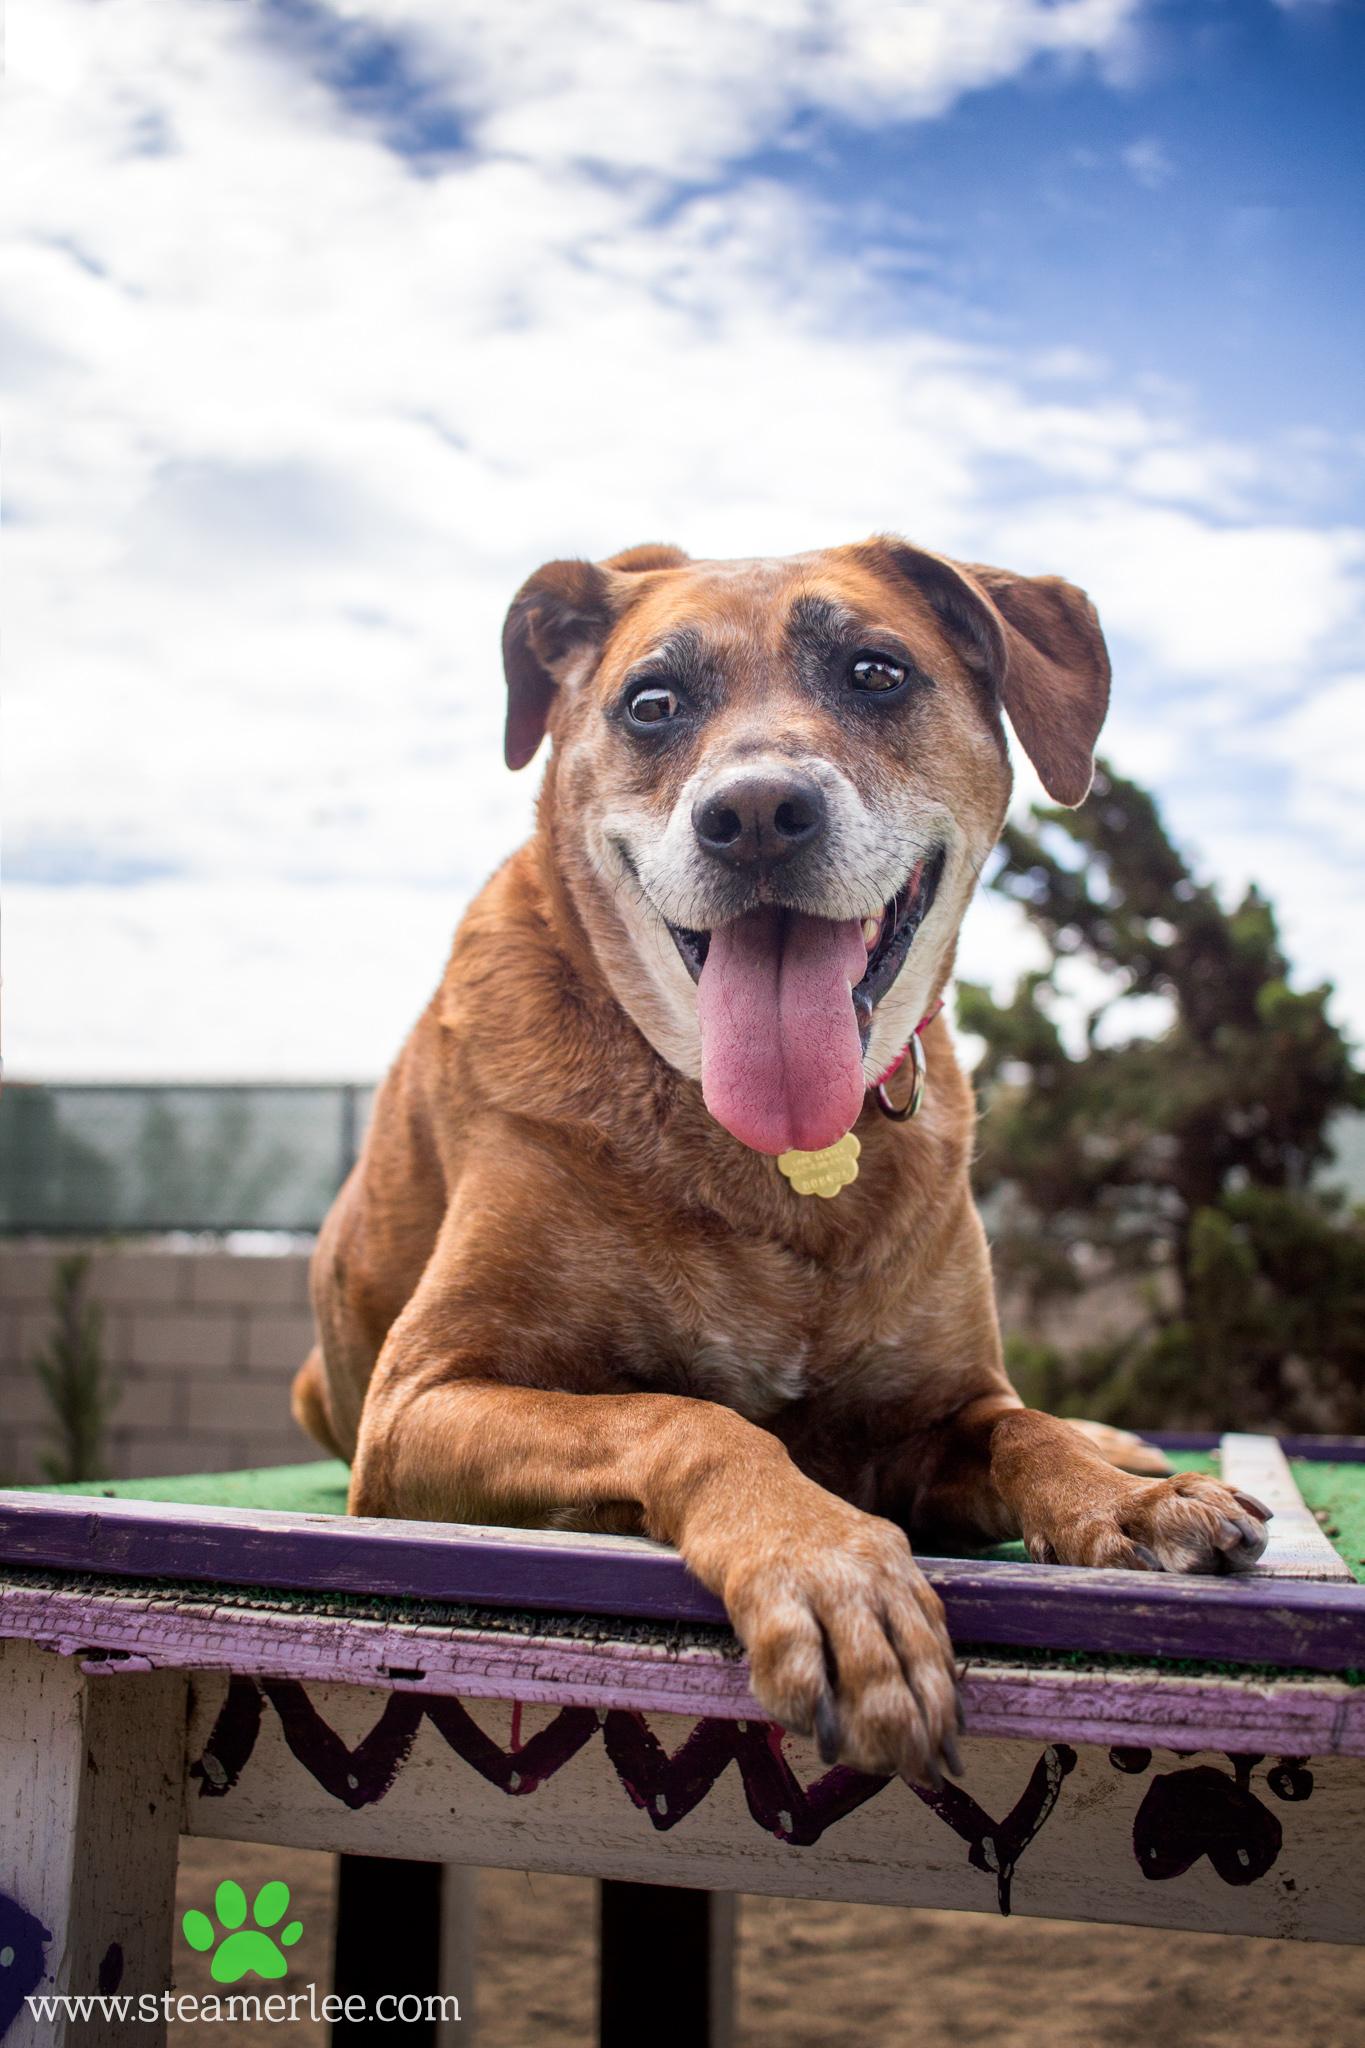 246-Orange-County-Dog-Photography-Steamer-Lee-Southern-California-SBACC.JPG